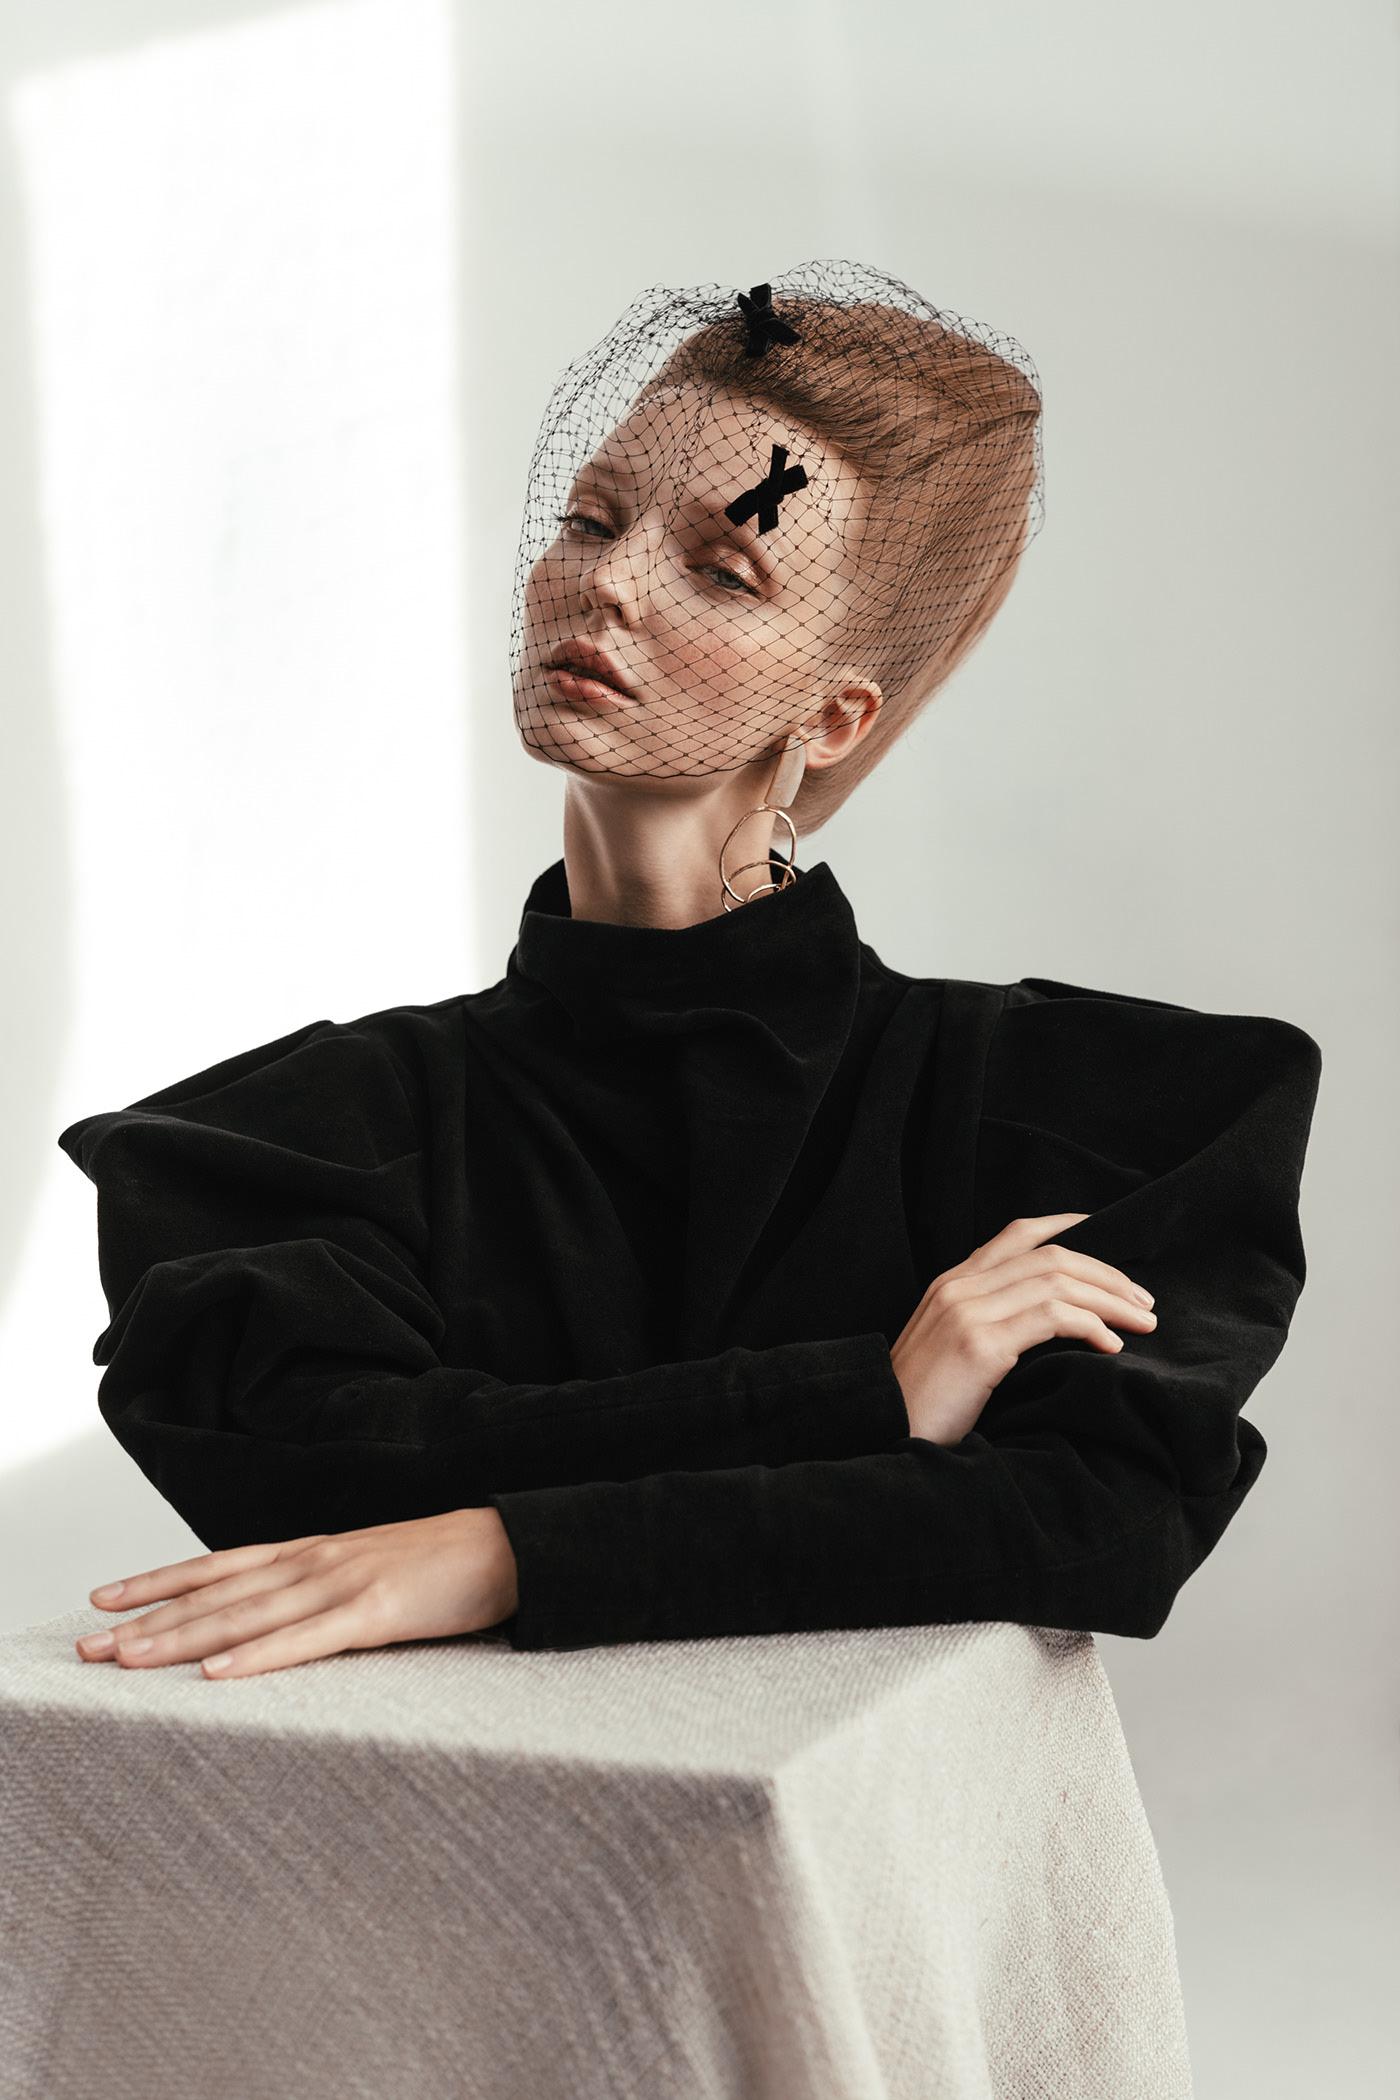 fashion photography woman by sebastian hilgetag